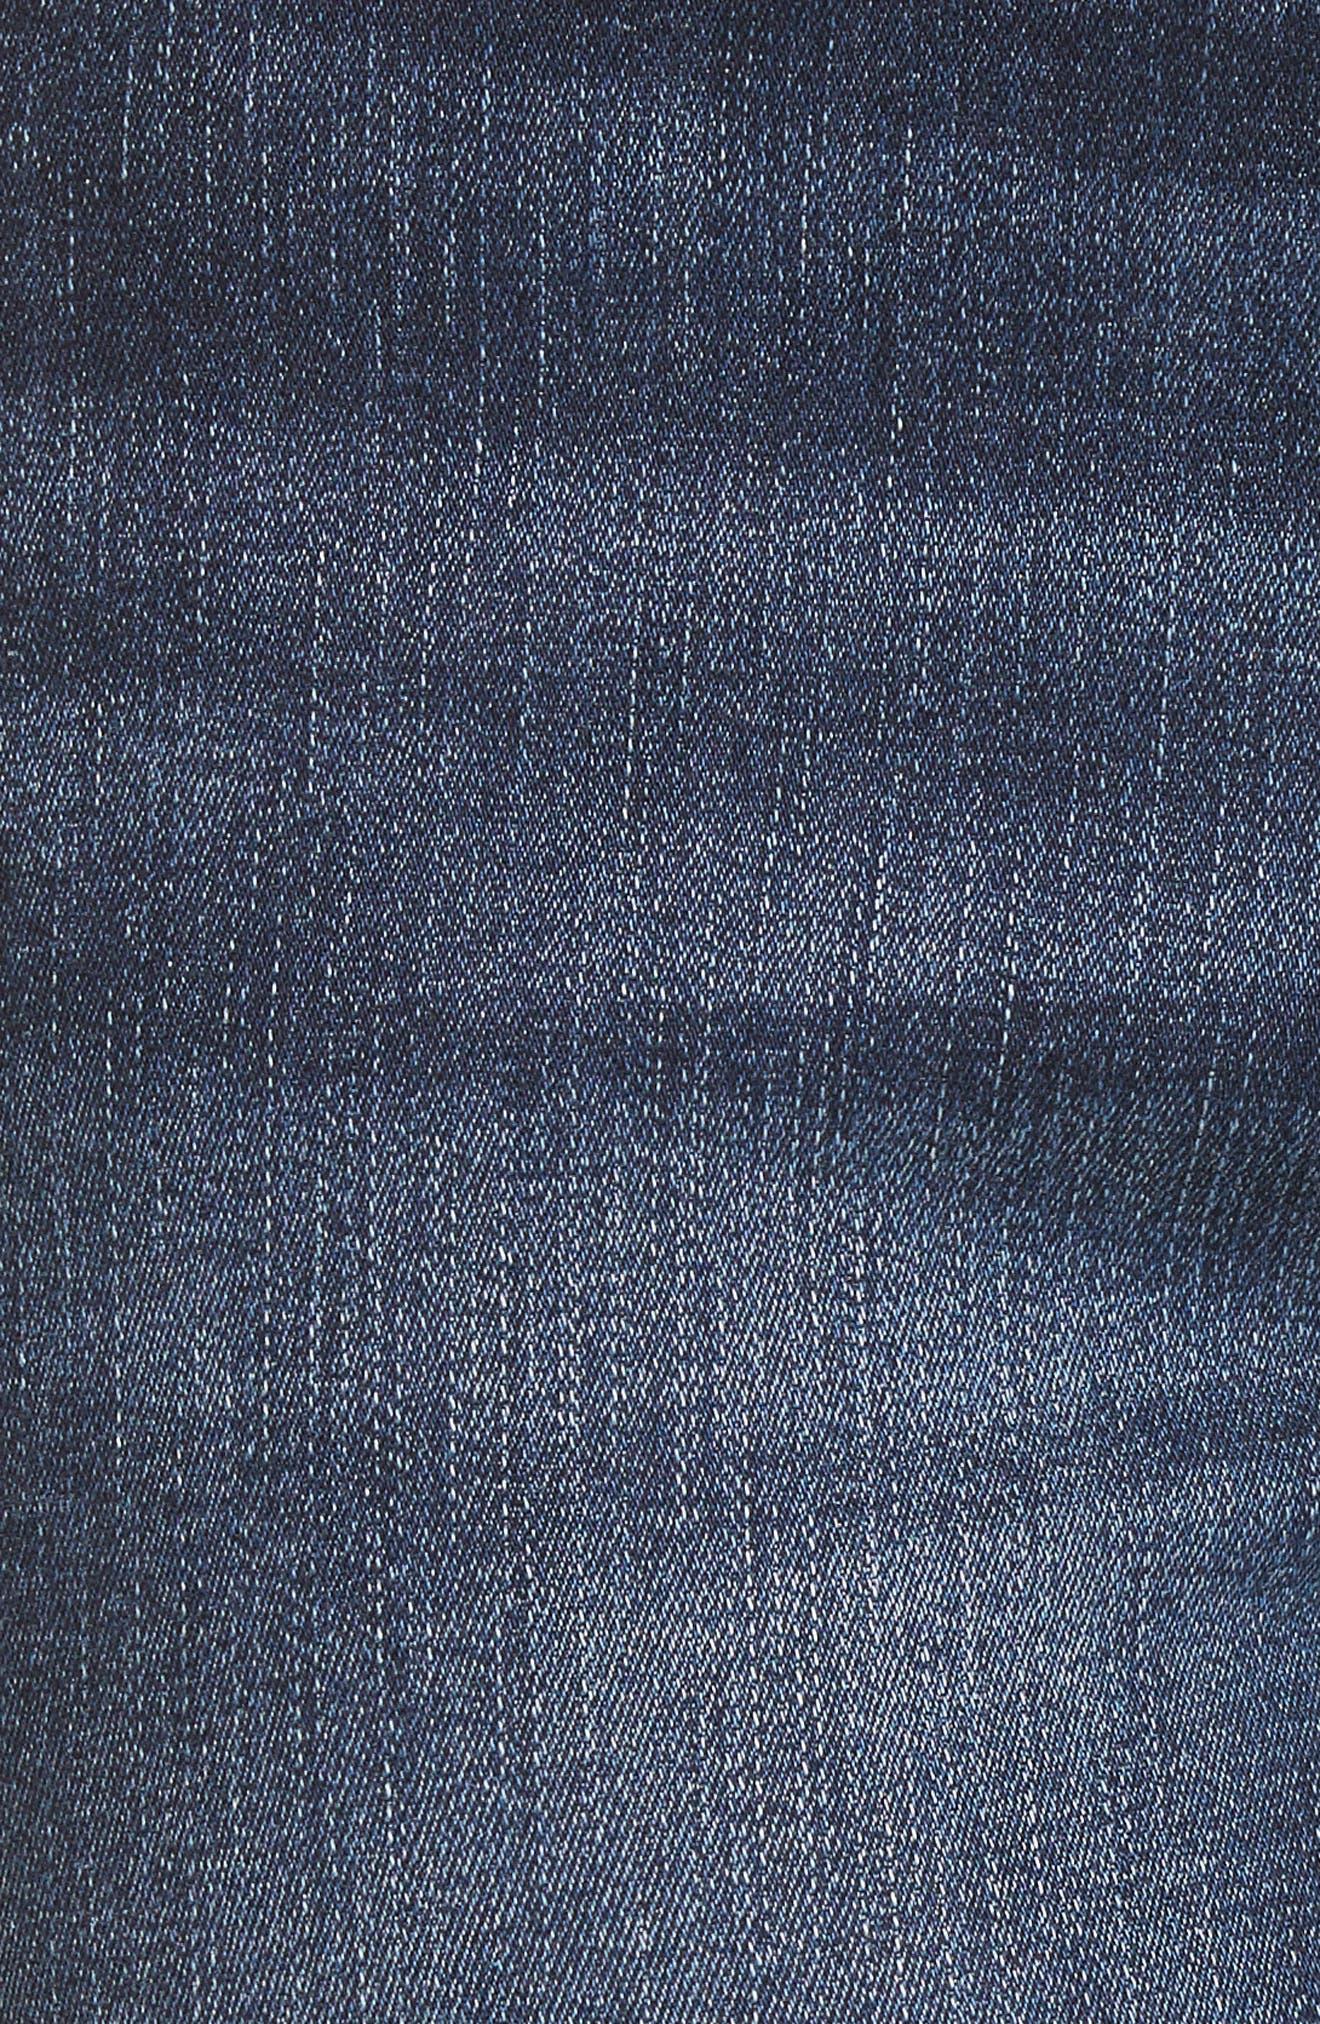 Carlie High Waist Ankle Skinny Jeans,                             Alternate thumbnail 7, color,                             Spritz